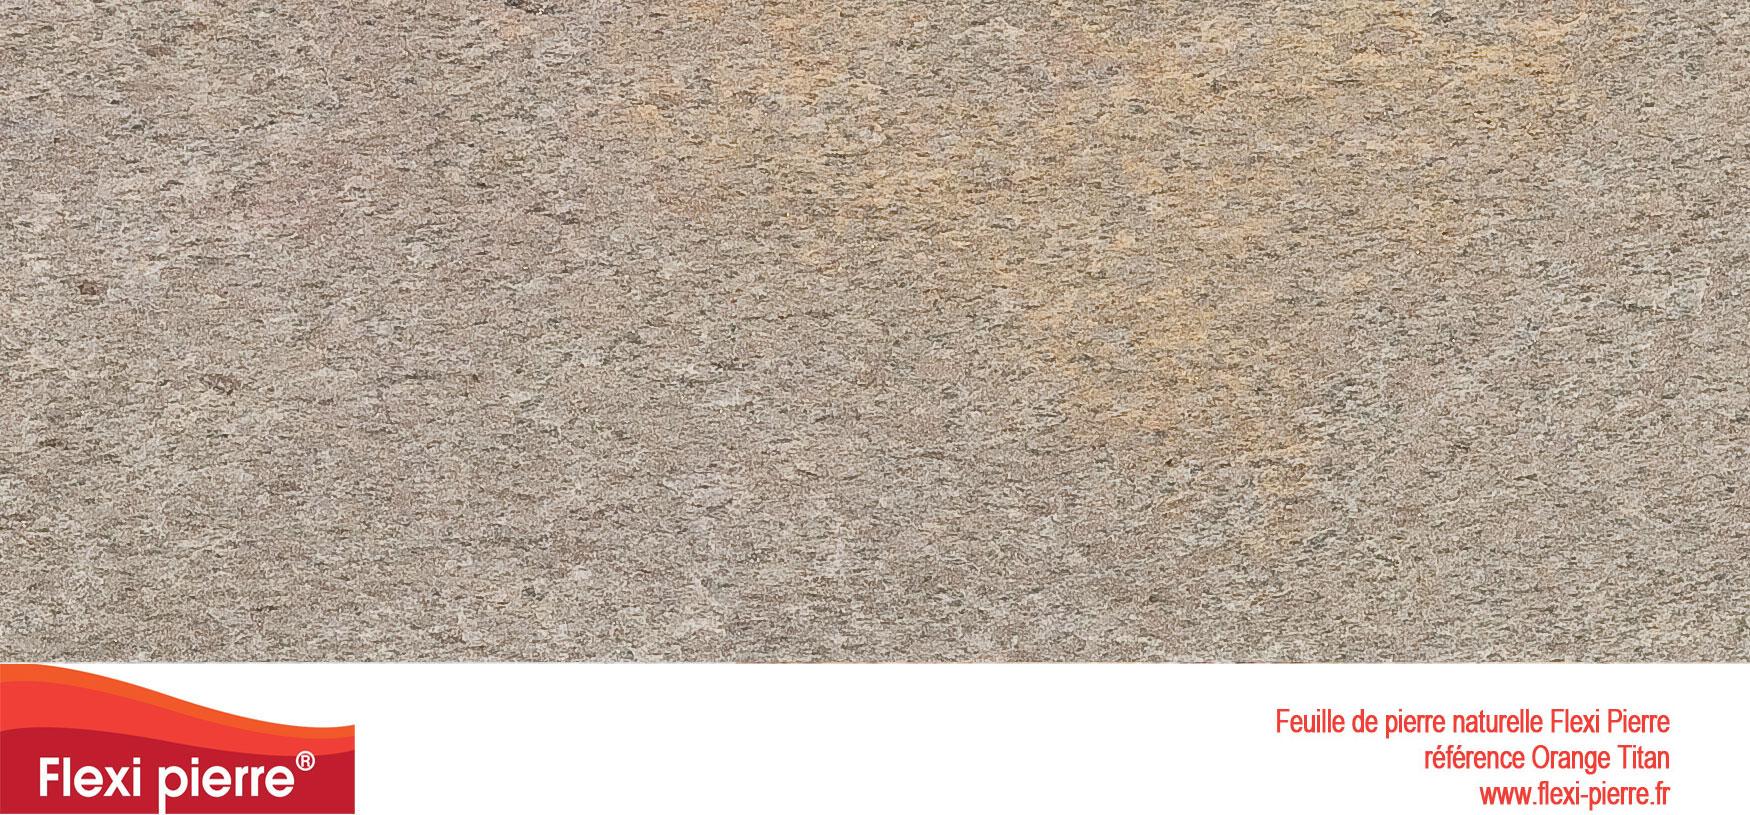 Feuille de pierre Orange Titan